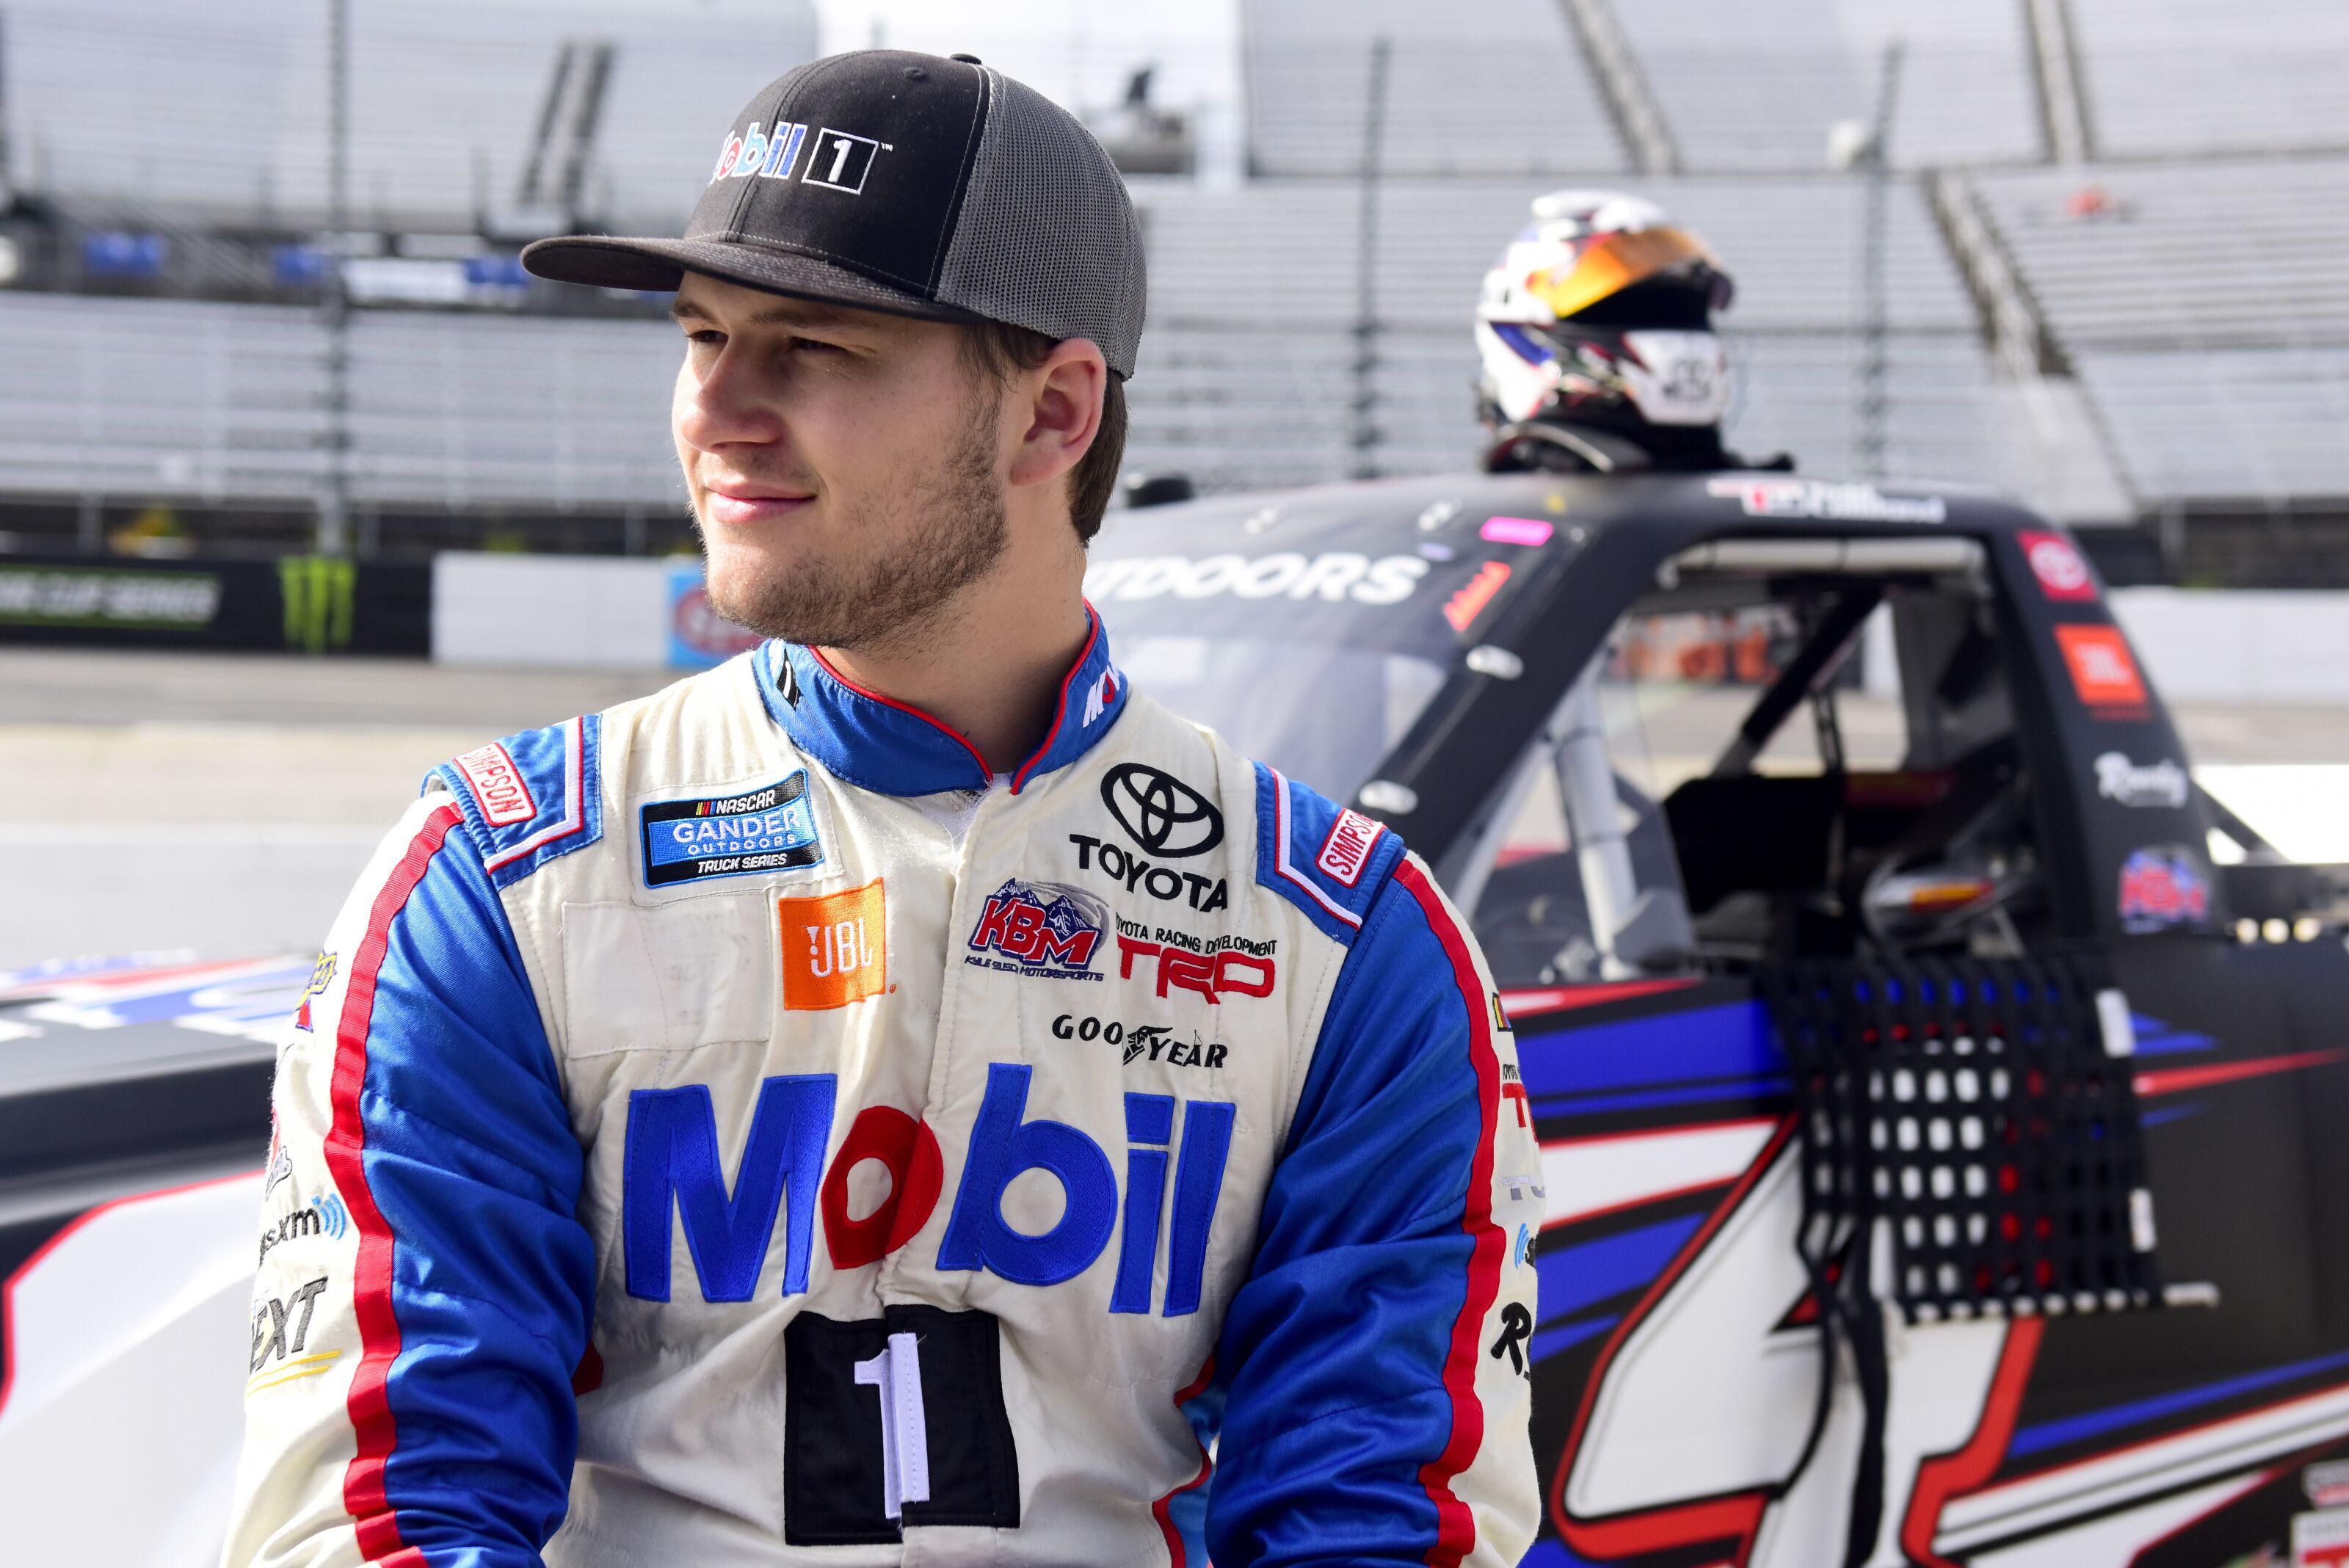 NASCAR: Did Todd Gilliland's outburst cause KBM departure?